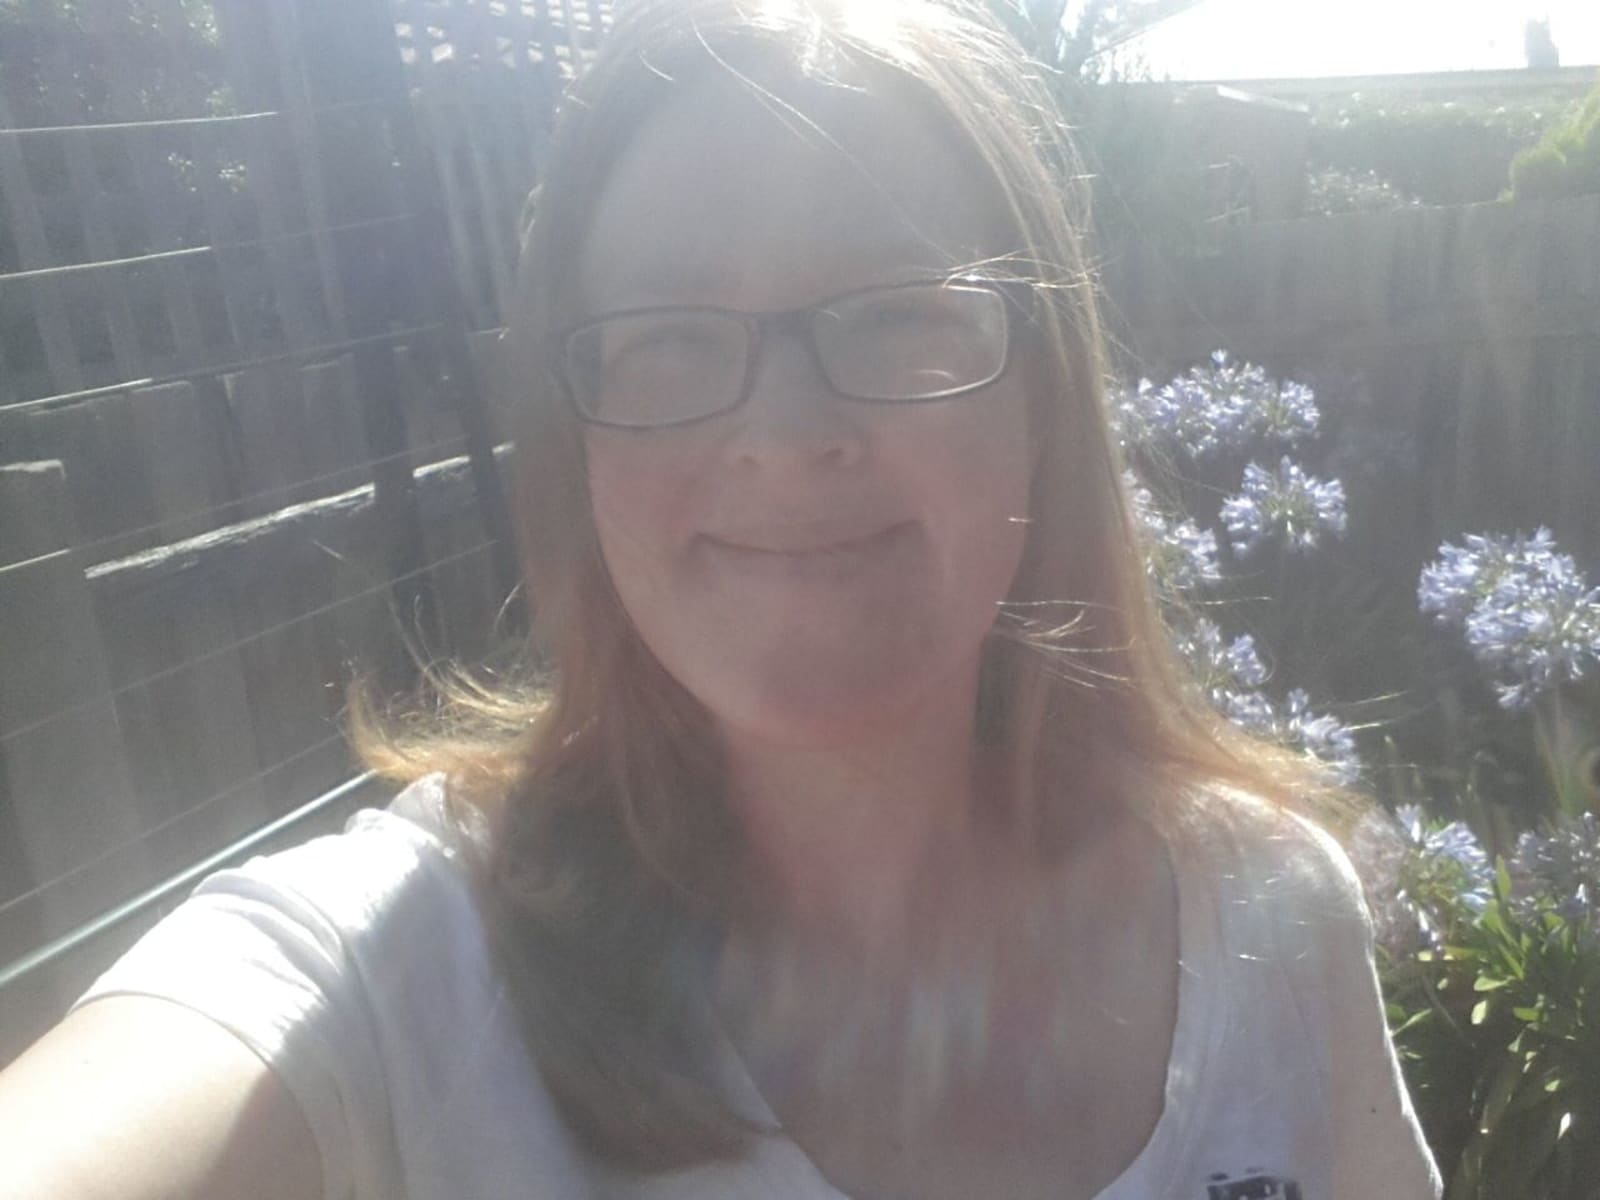 Angela from Melbourne, Victoria, Australia